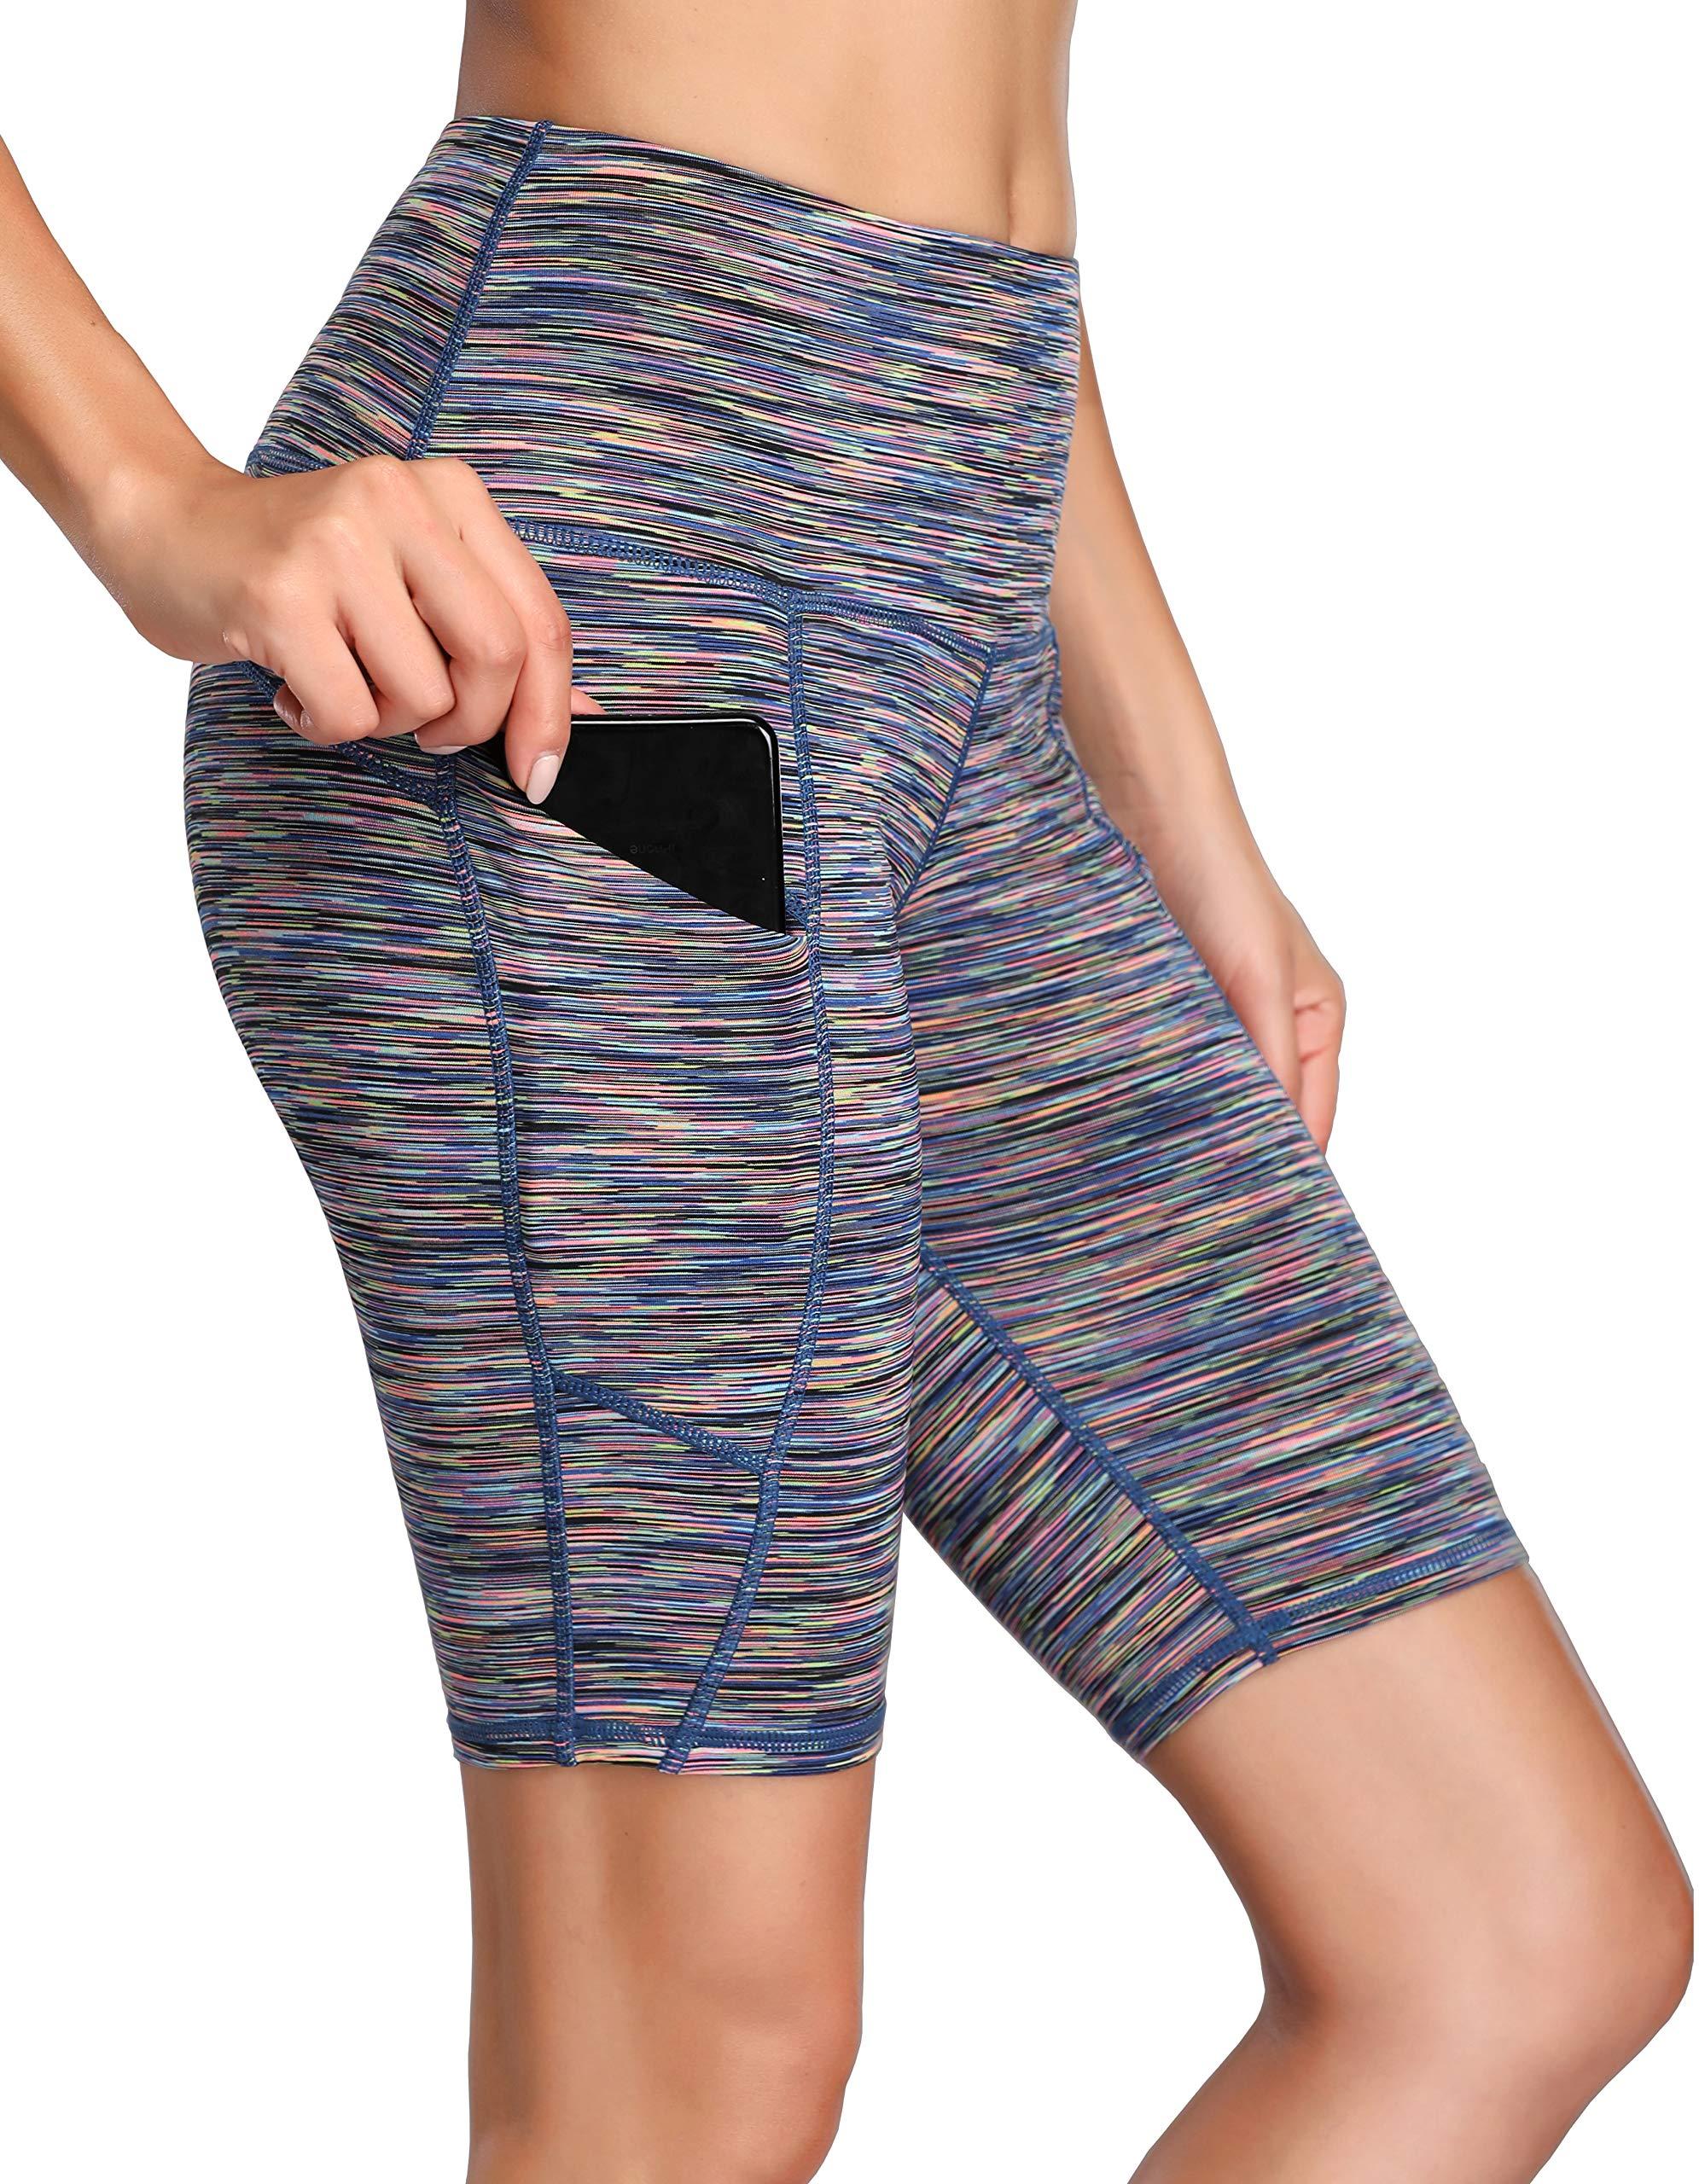 Oalka Women's Yoga Short Side Pockets High Waist Workout Running Shorts Space Dye Camo Multicolor XL by Oalka